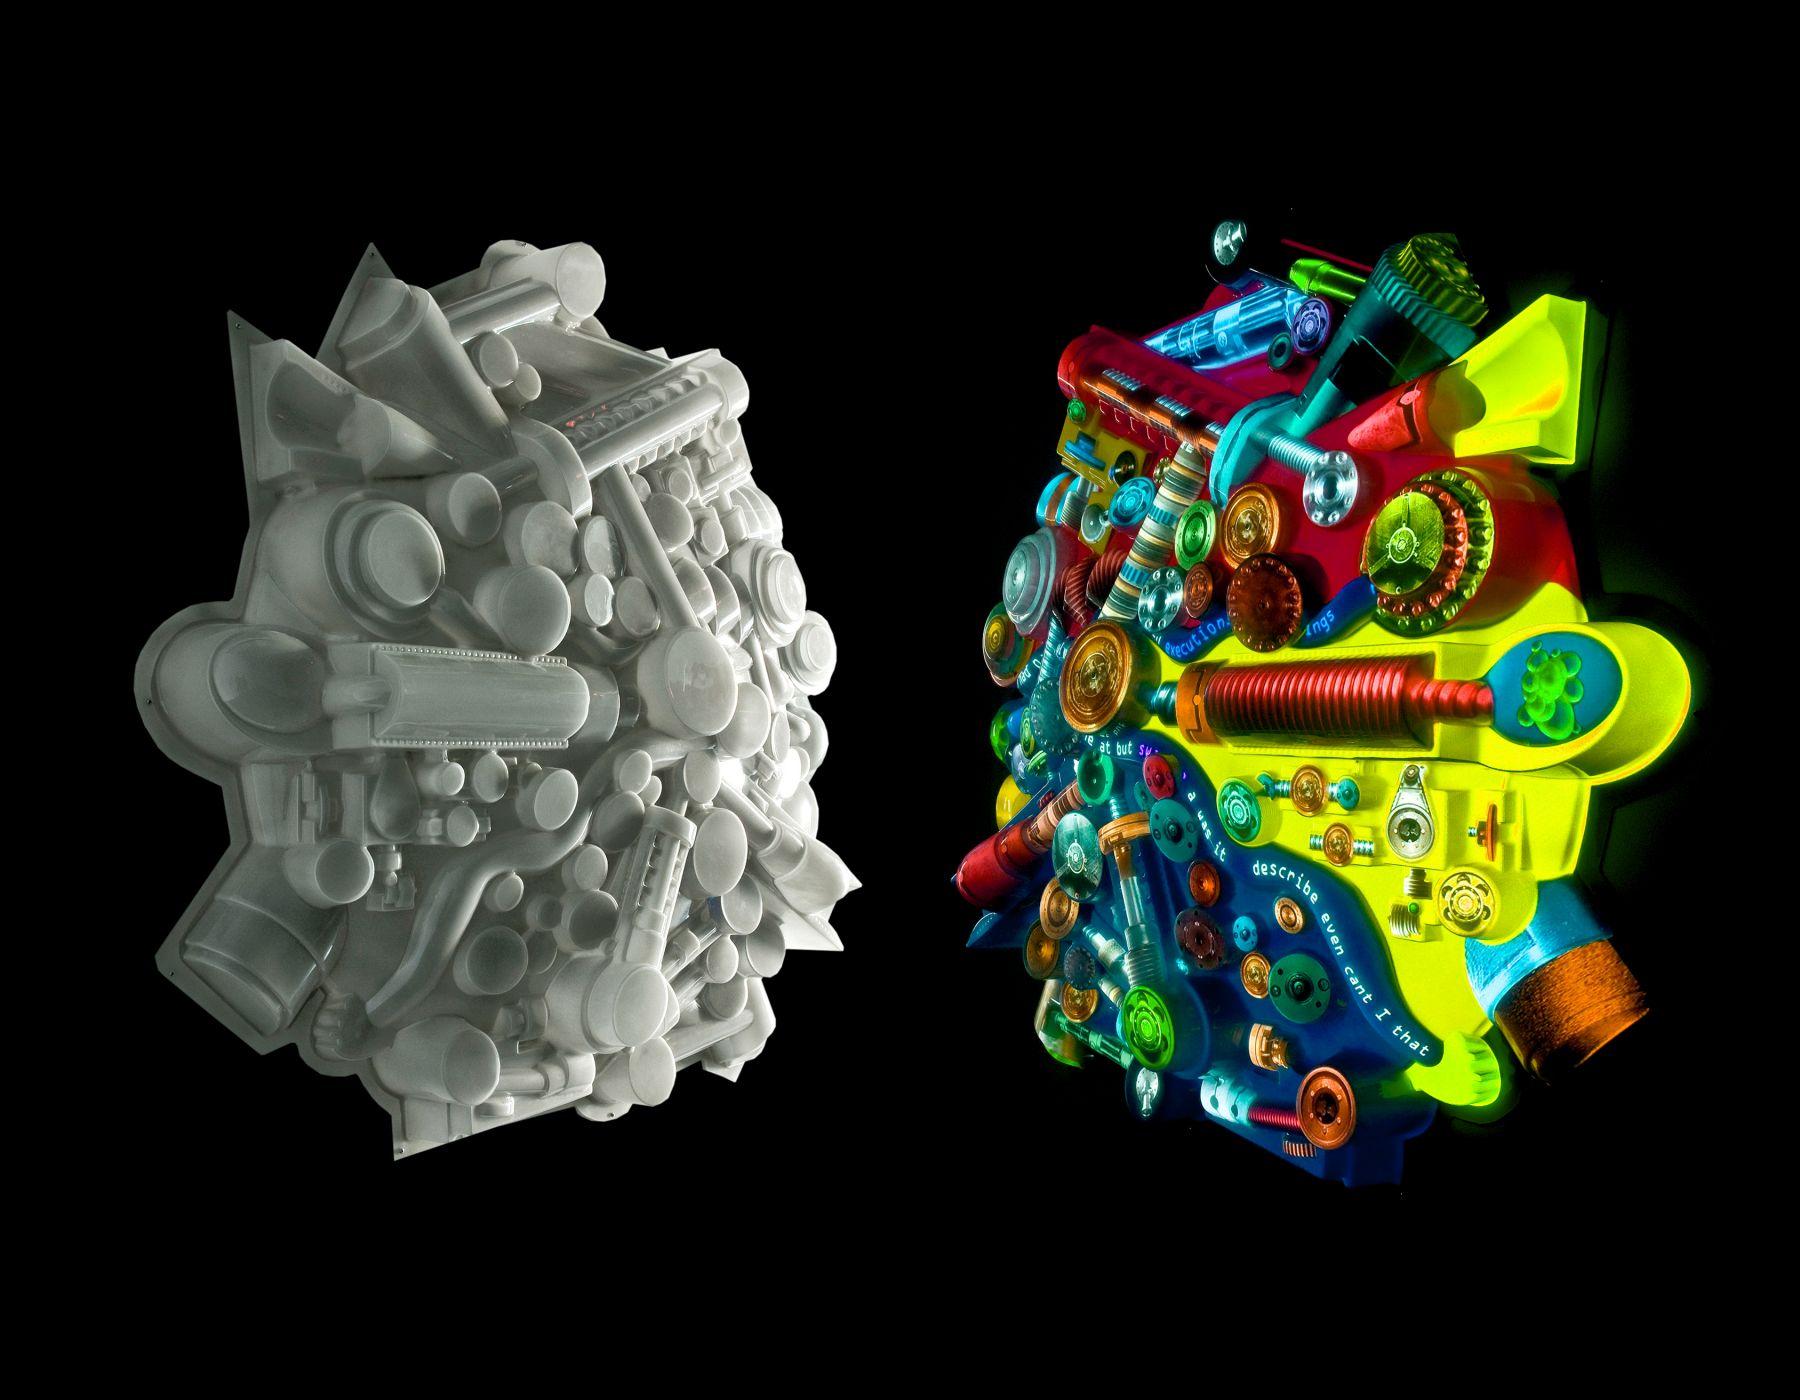 PETER SARKISIAN Extruded Video Engine (large version) #3, 2007